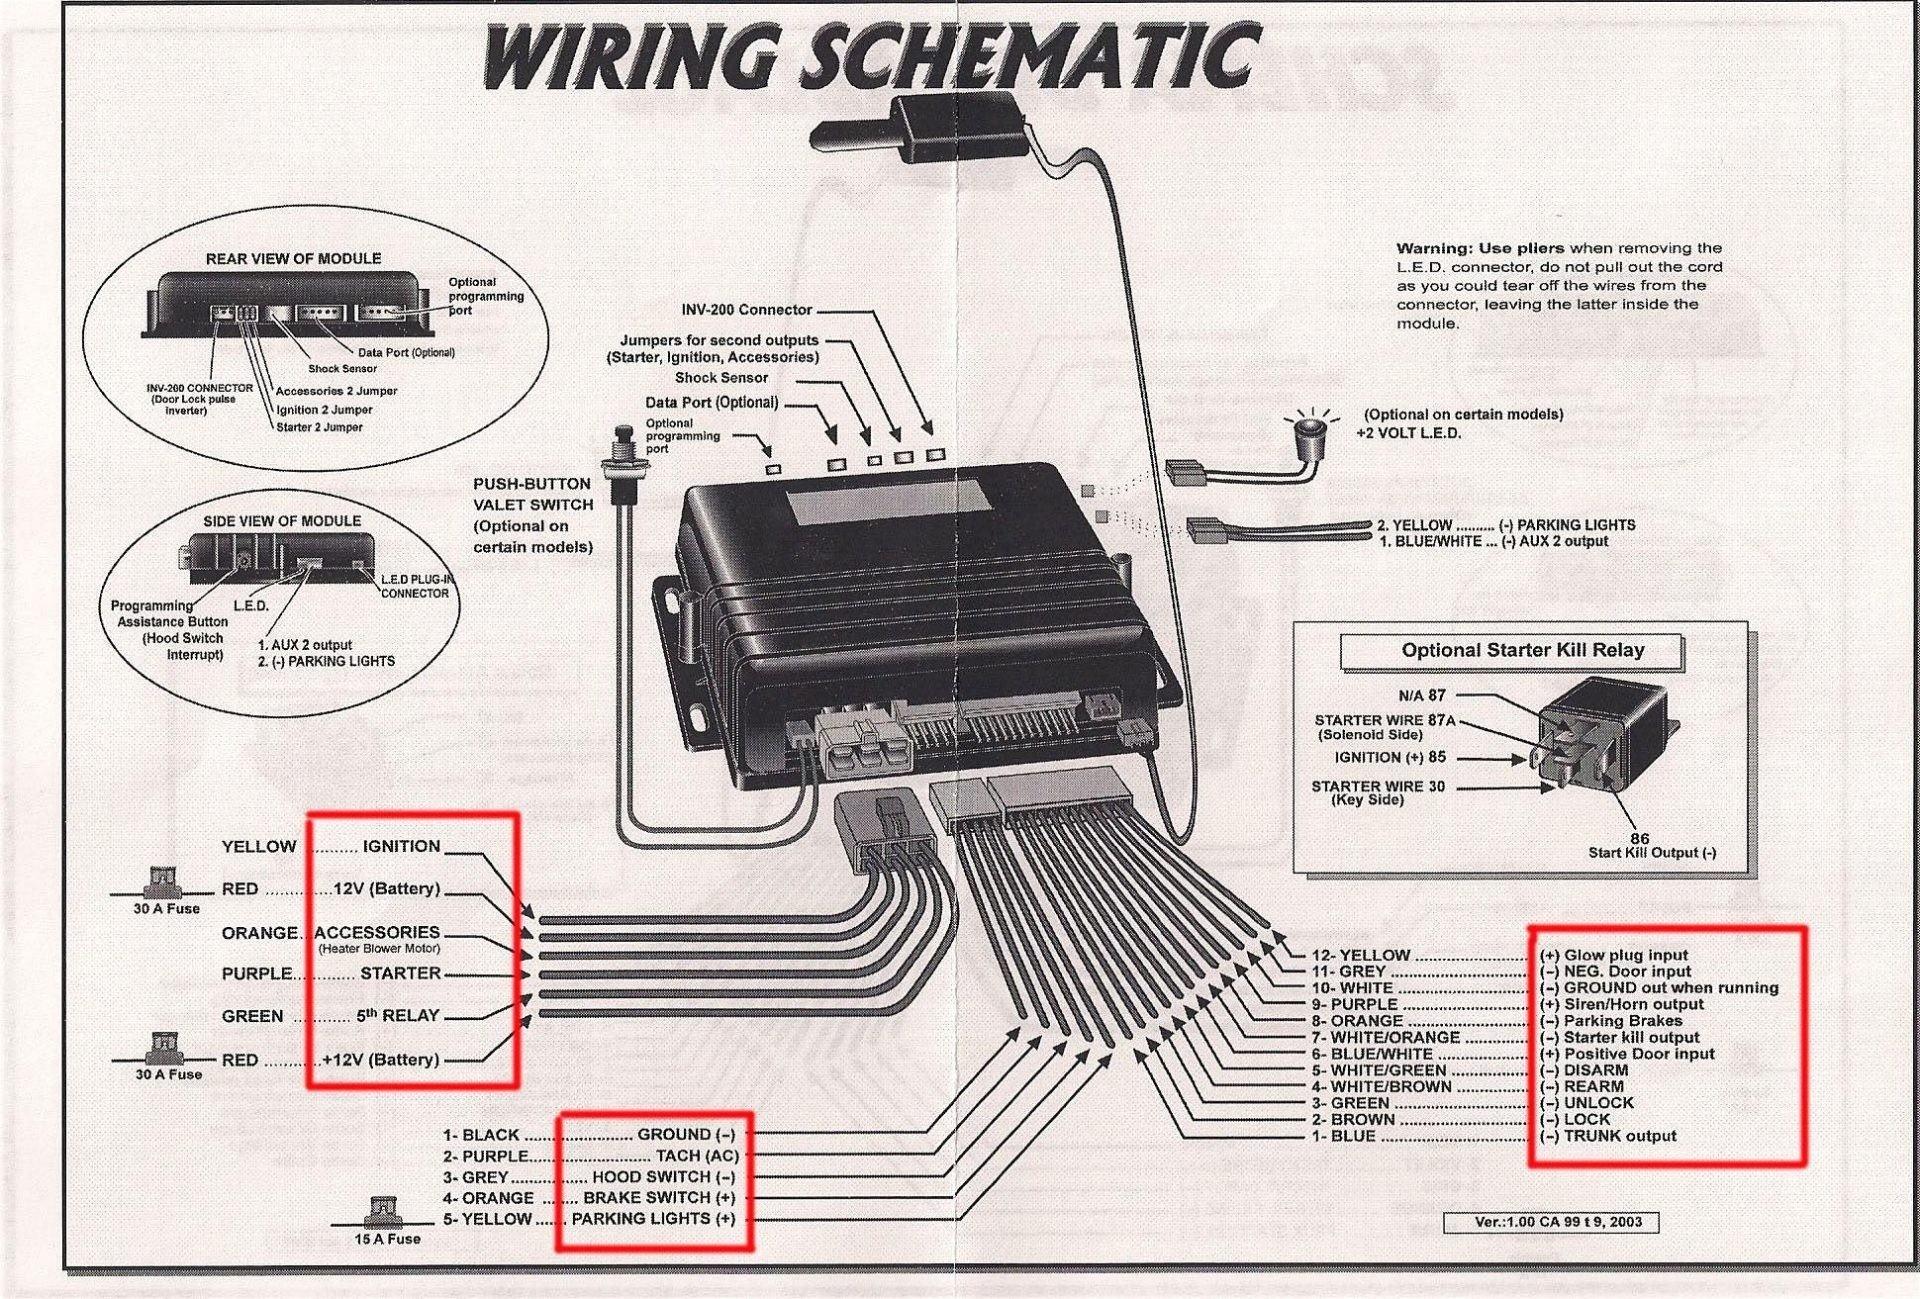 Audiovox Car Alarm Wiring Diagram New Car Security System Wiring Diagram Irelandnews Of Audiovox Car Alarm Wiring Diagram